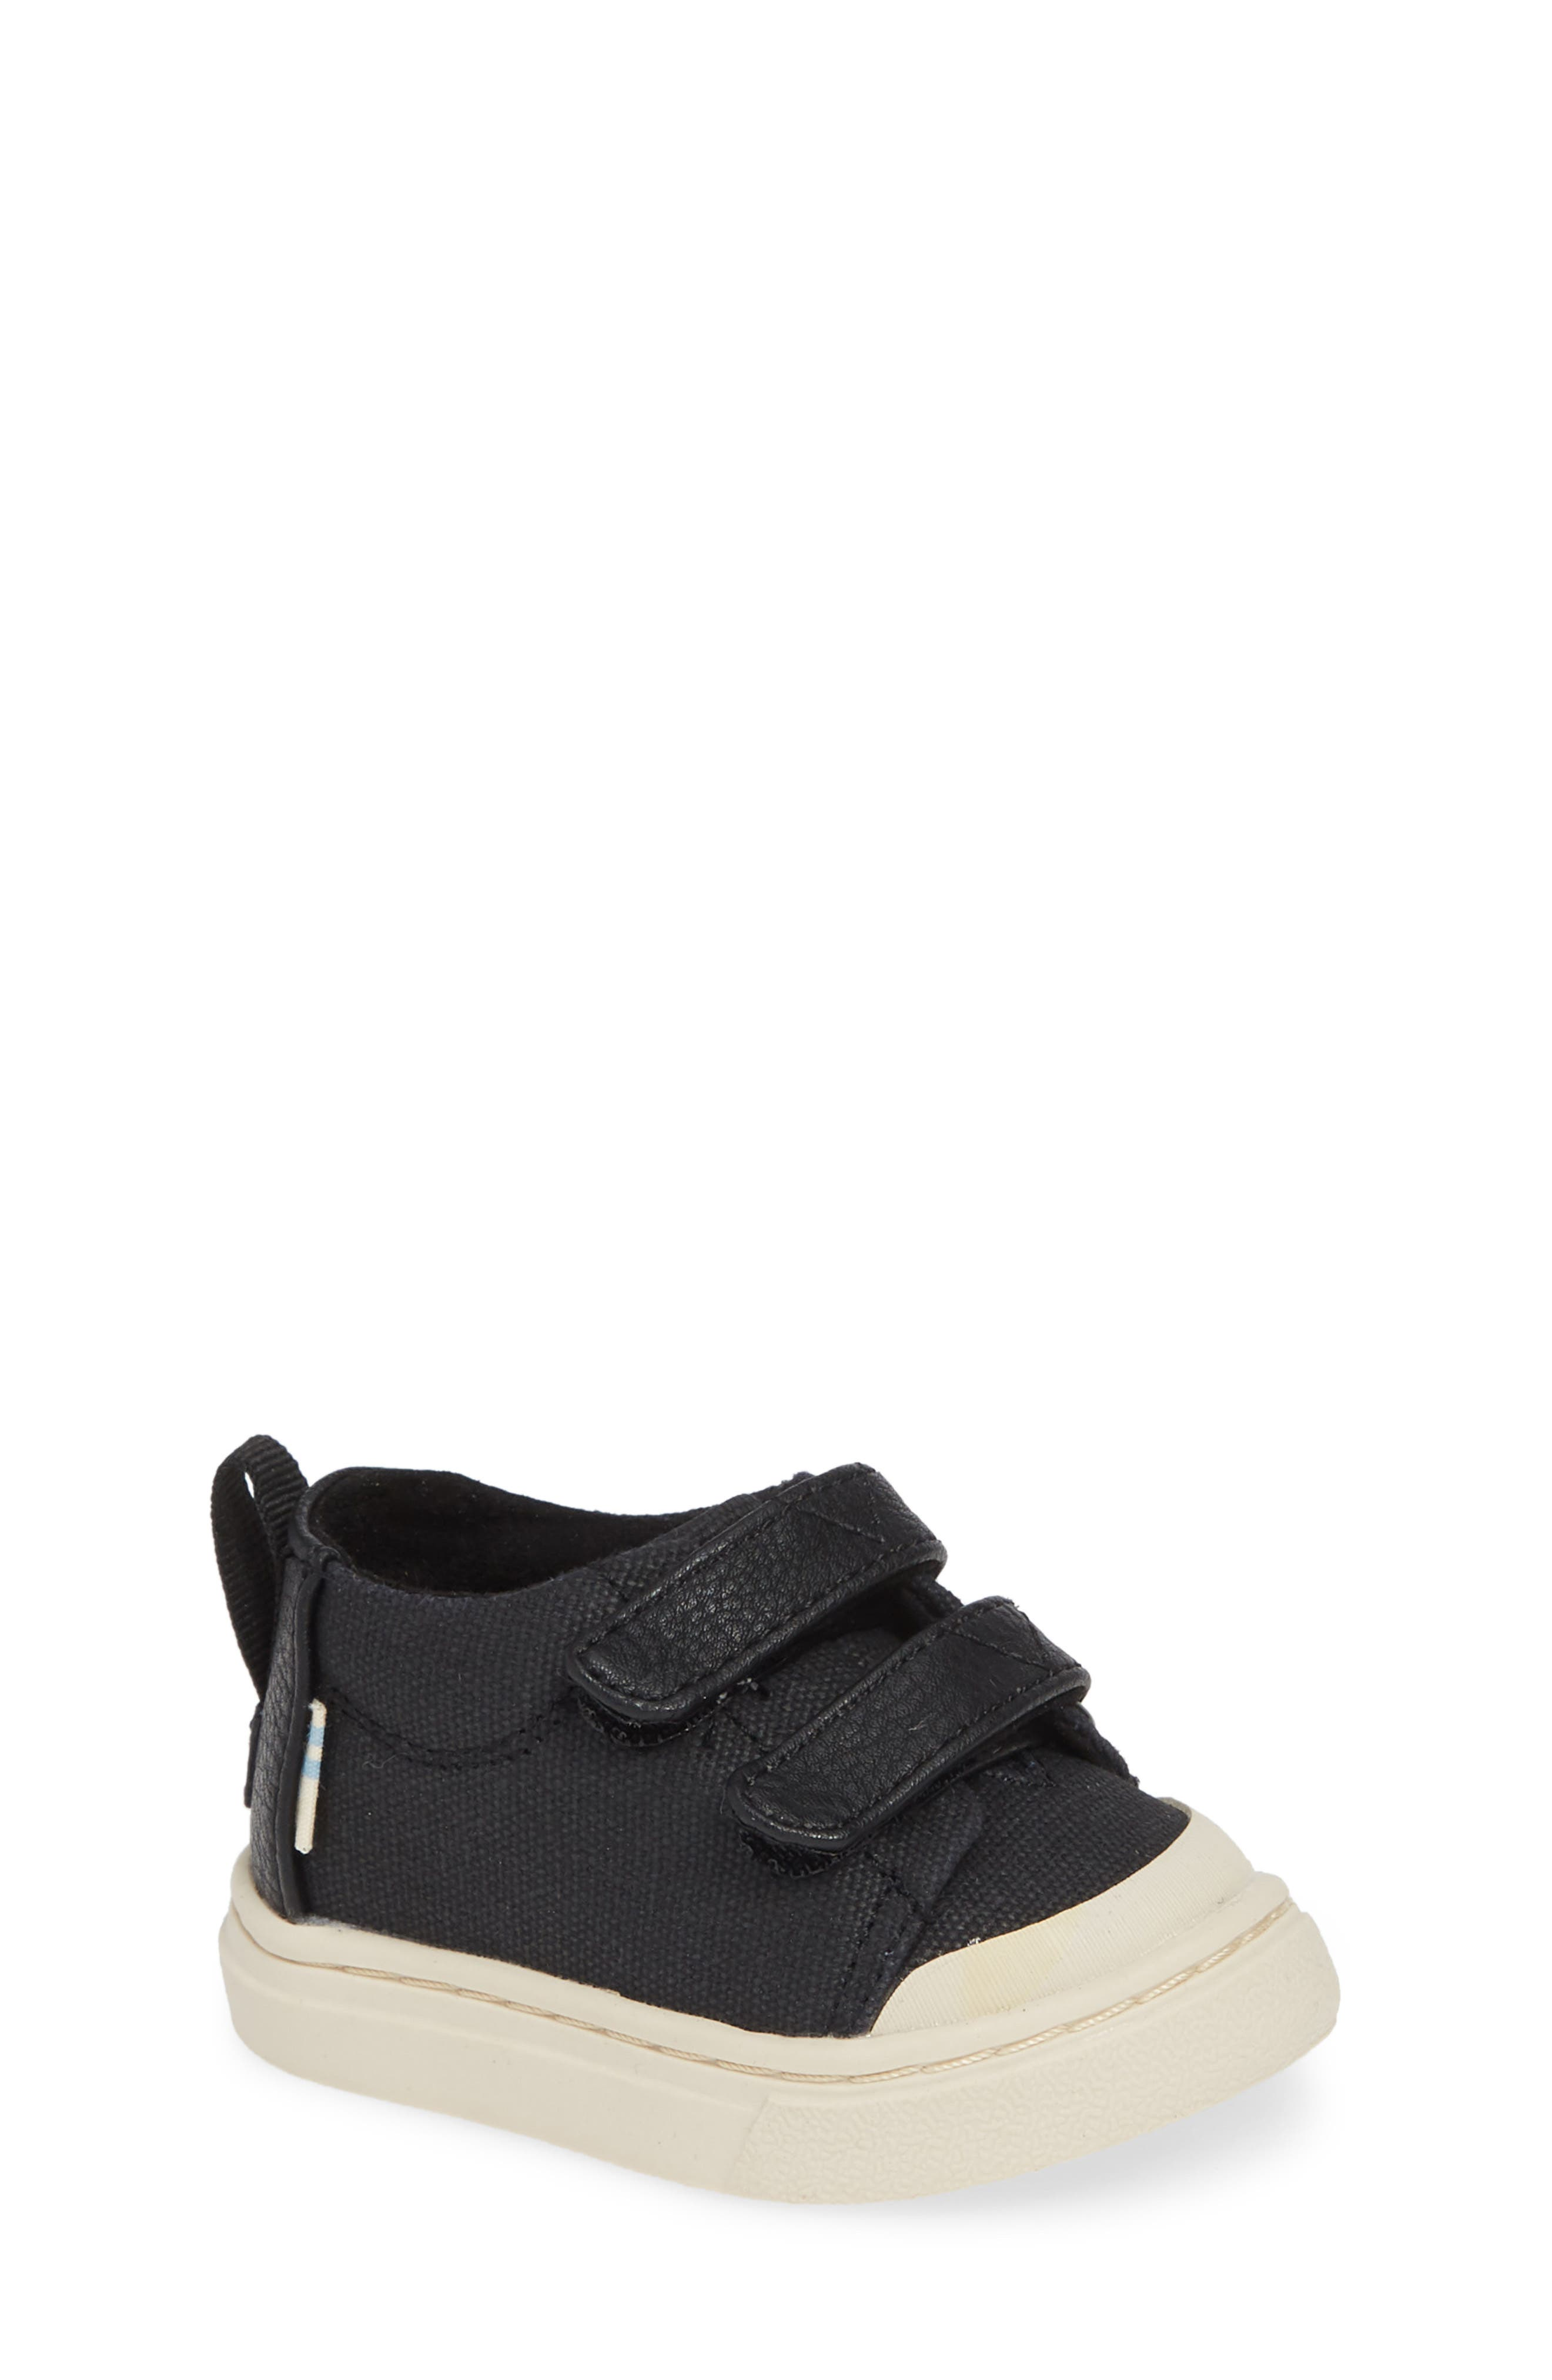 Lenny Mid Top Sneaker,                         Main,                         color, BLACK TEXTURAL CANVAS